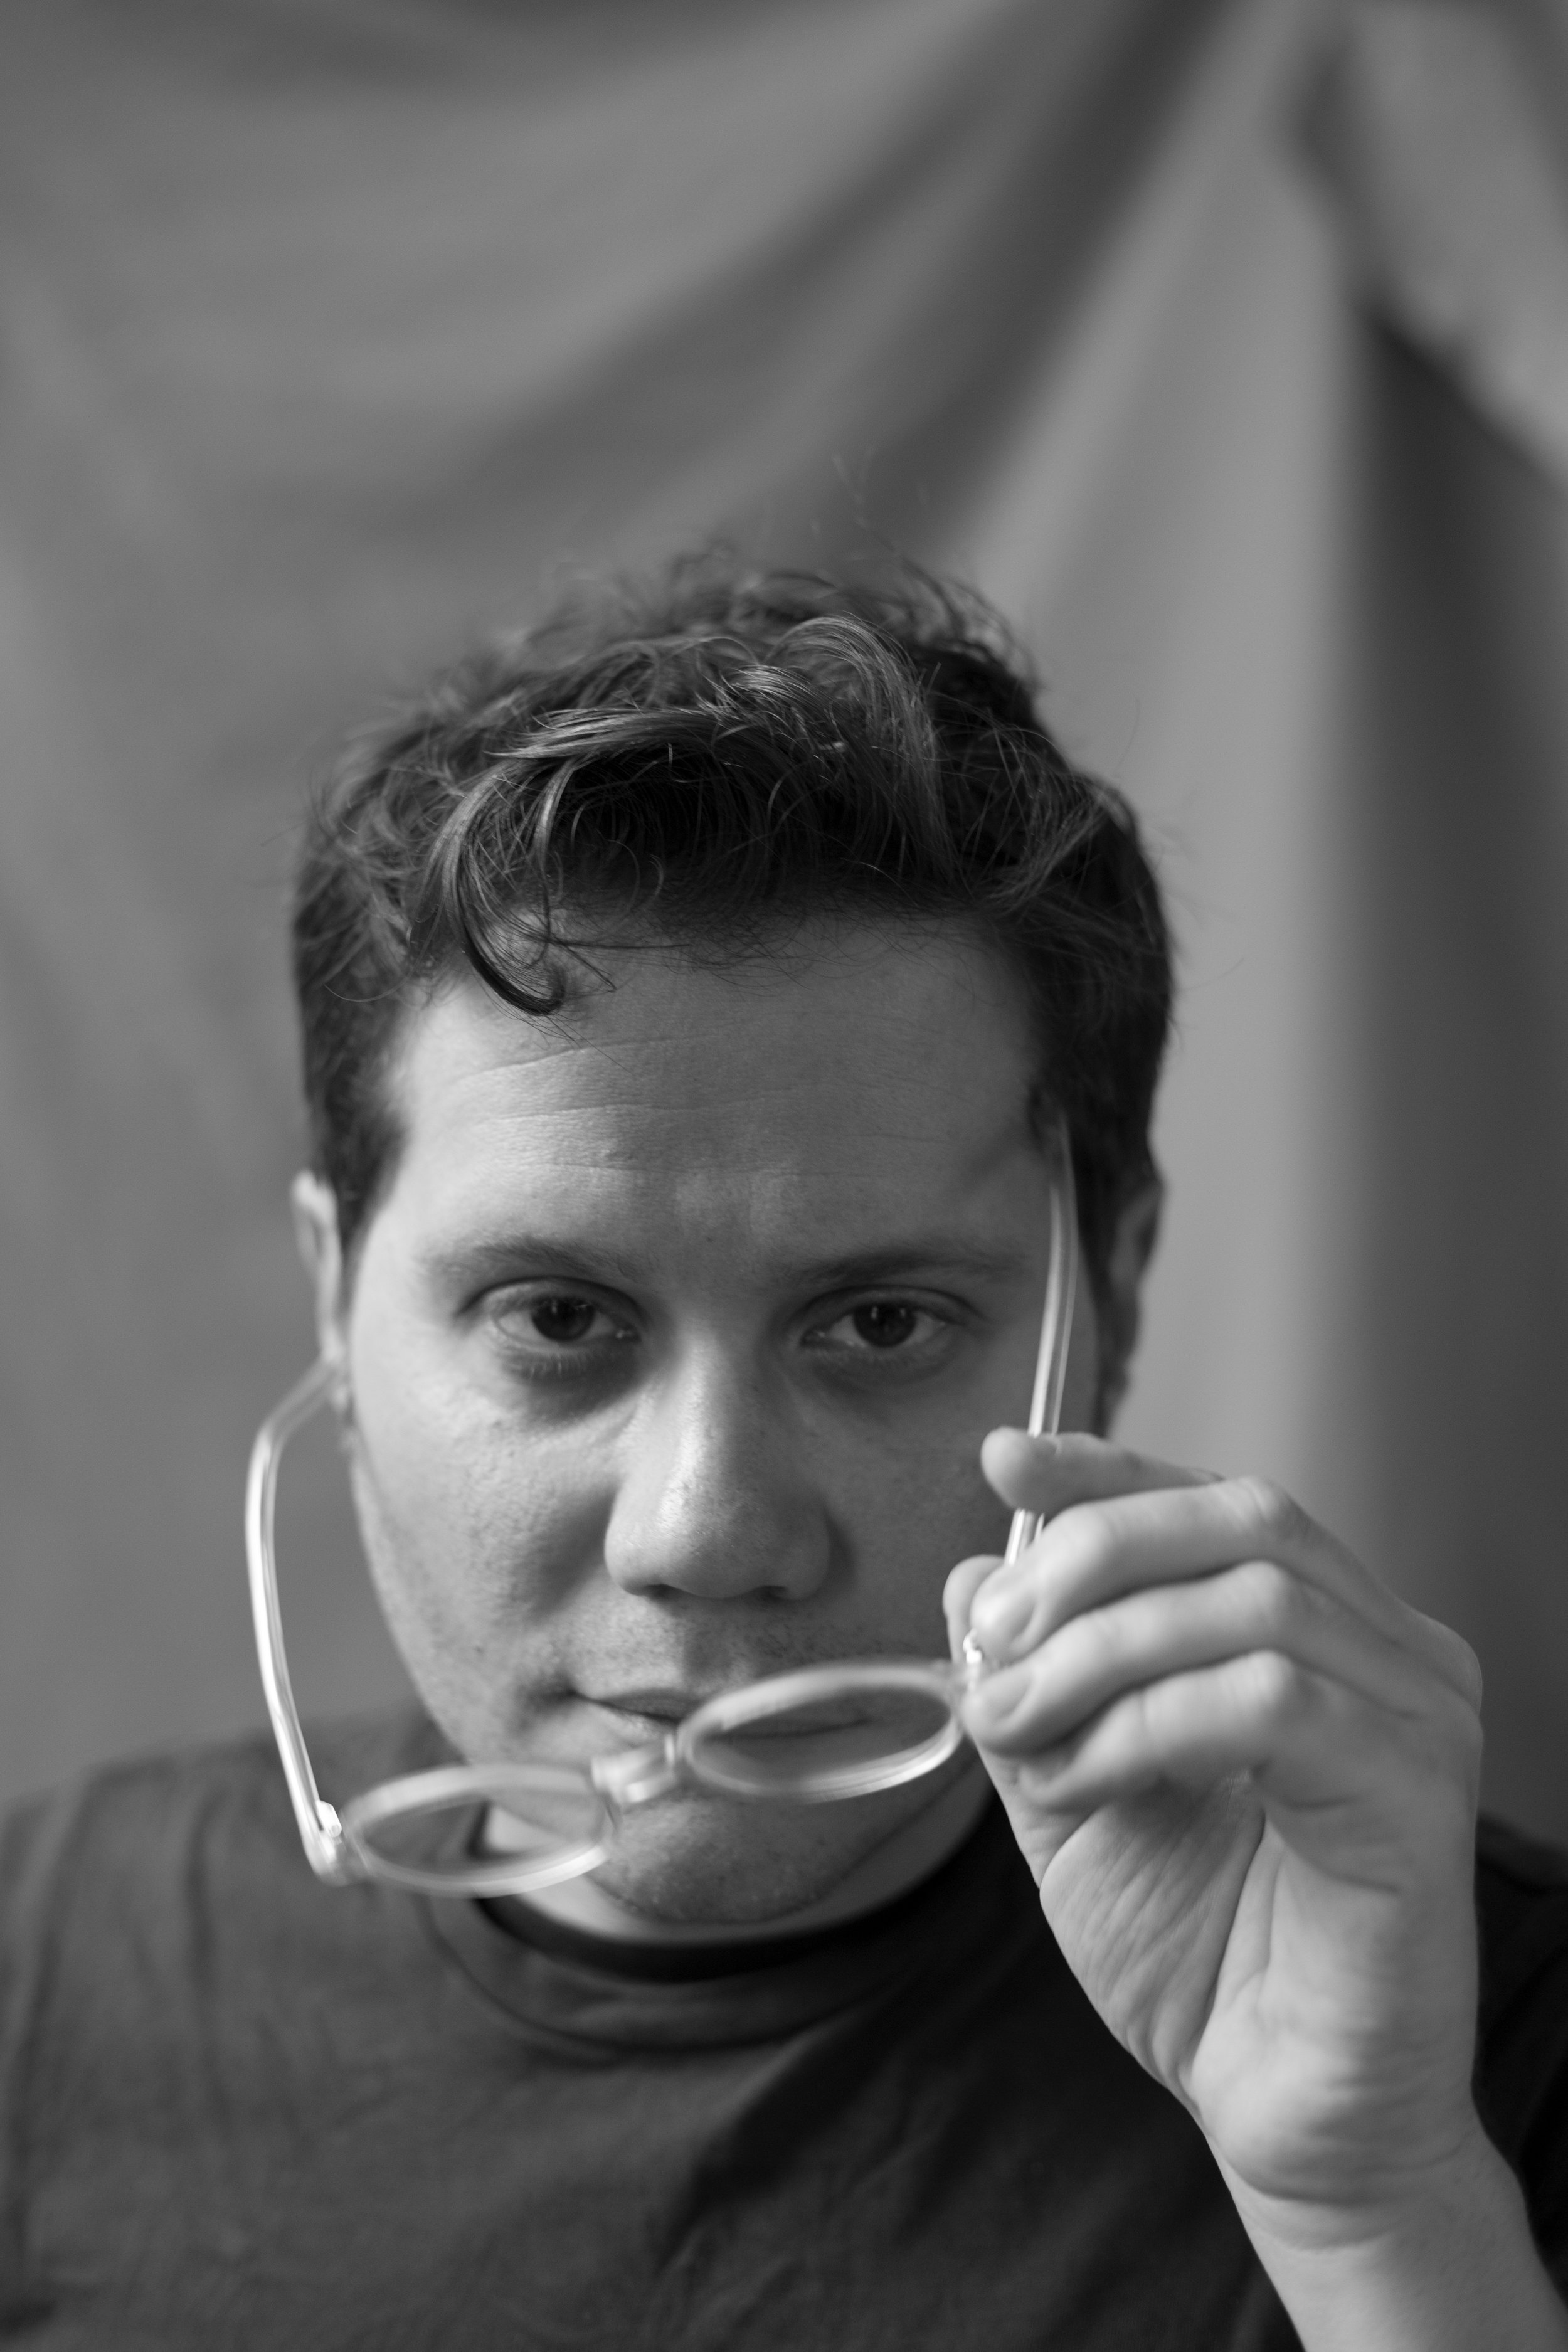 Ricky Maldonado